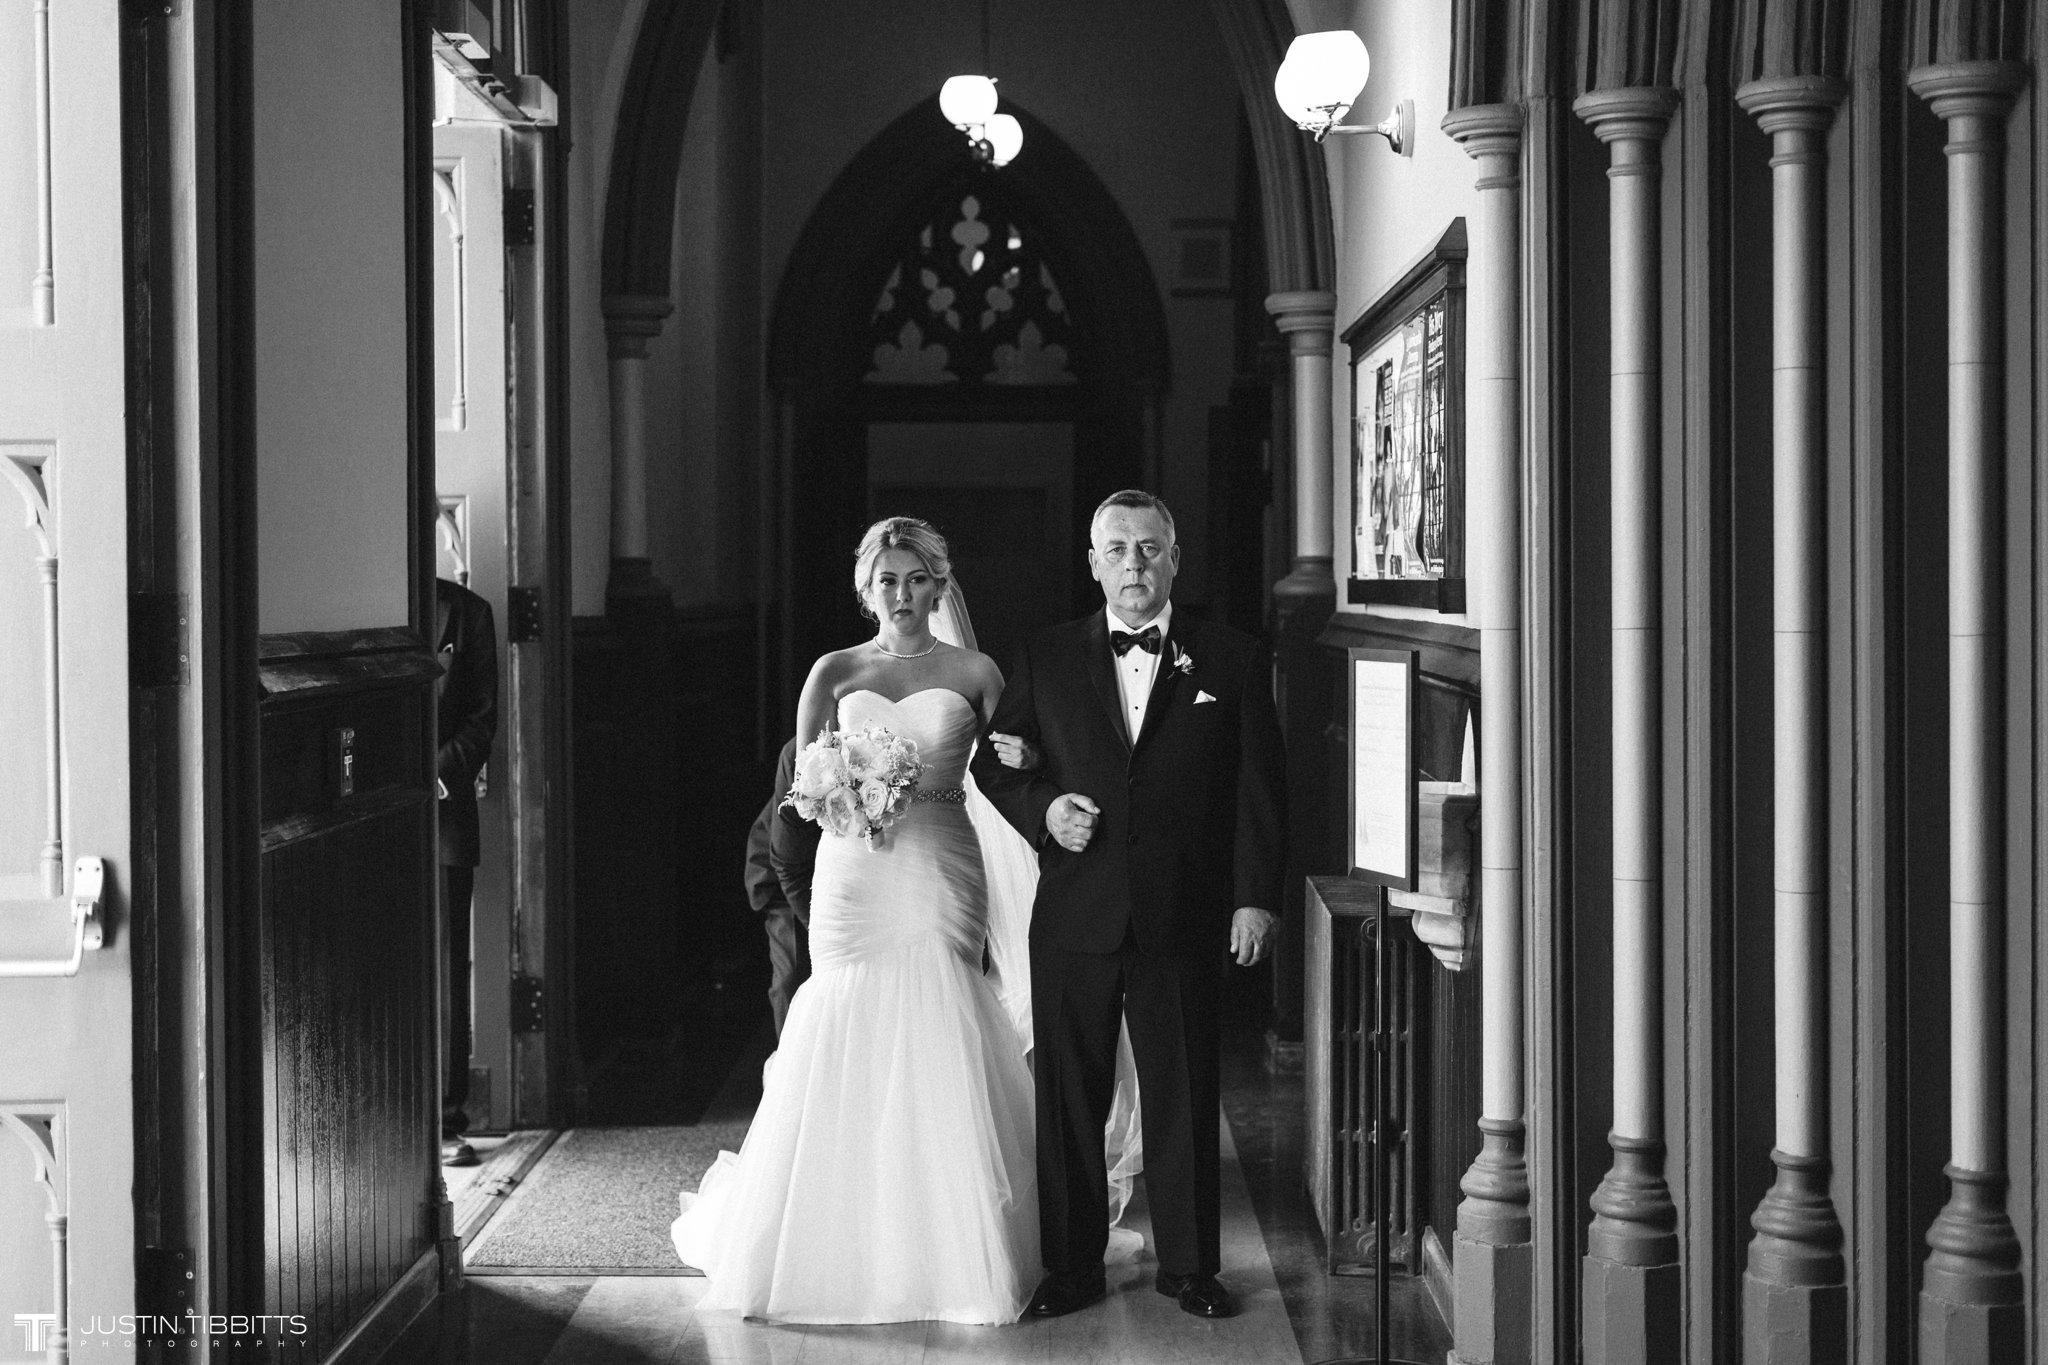 state-room-wedding-photos-with-amanda-and-nick_0073